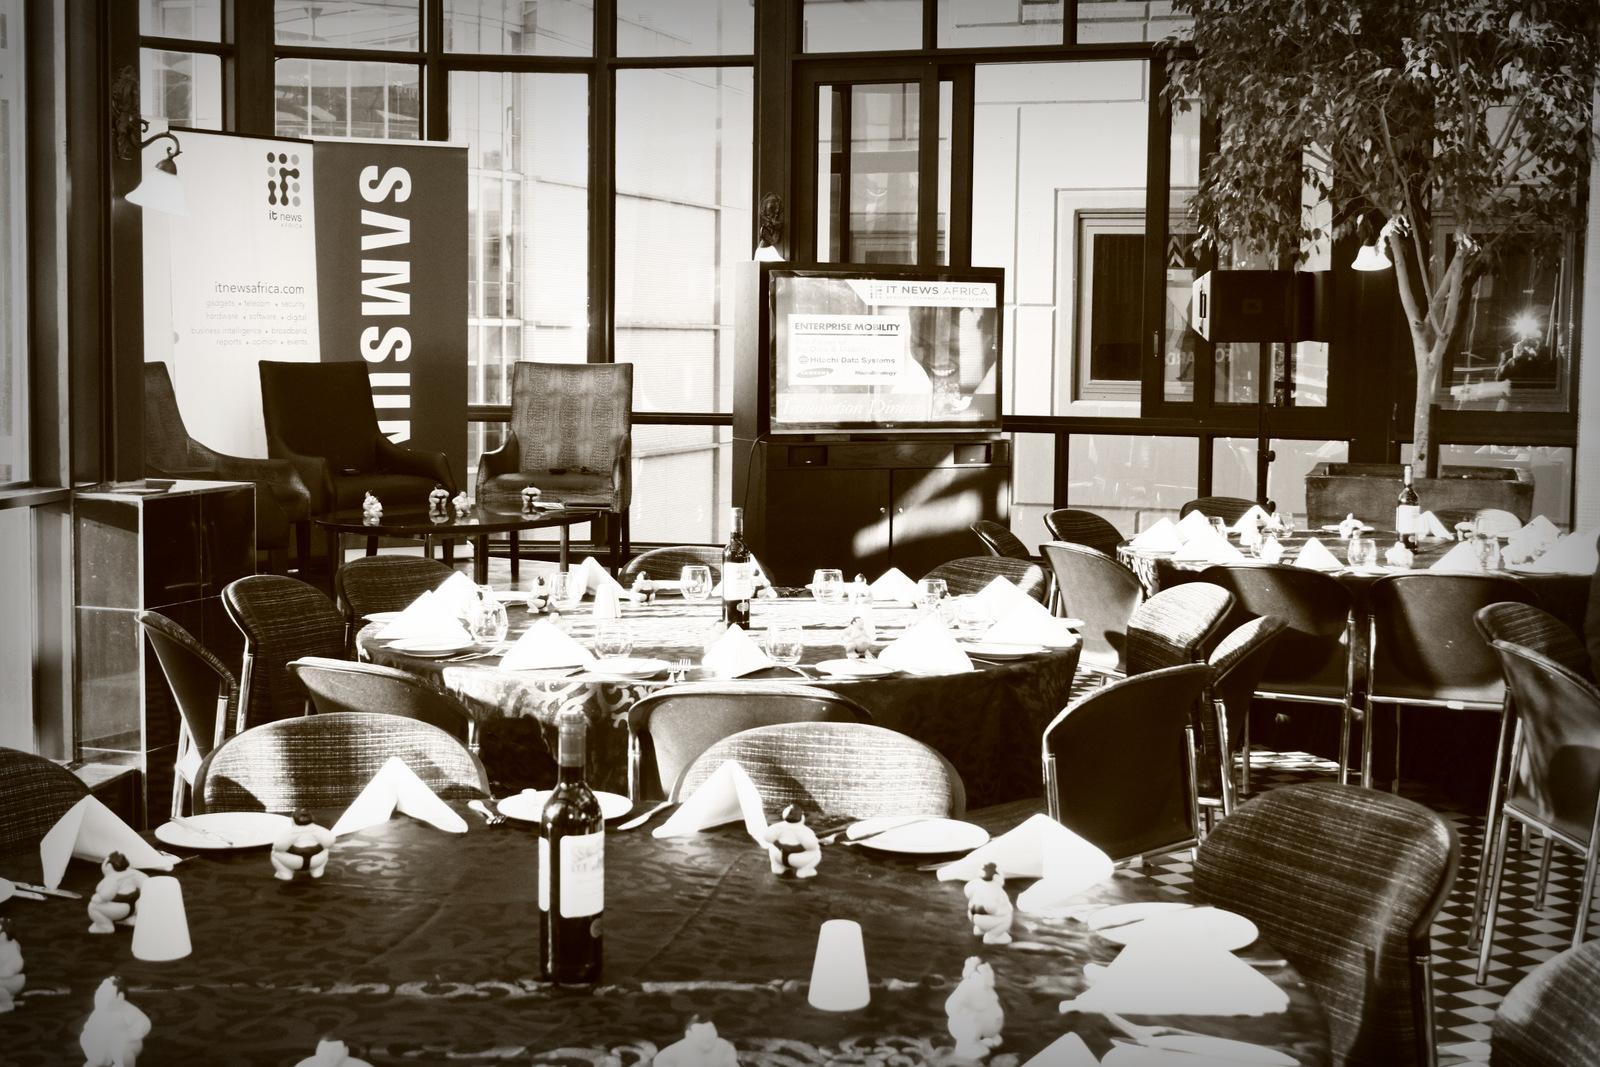 Innovation Dinner August 2014